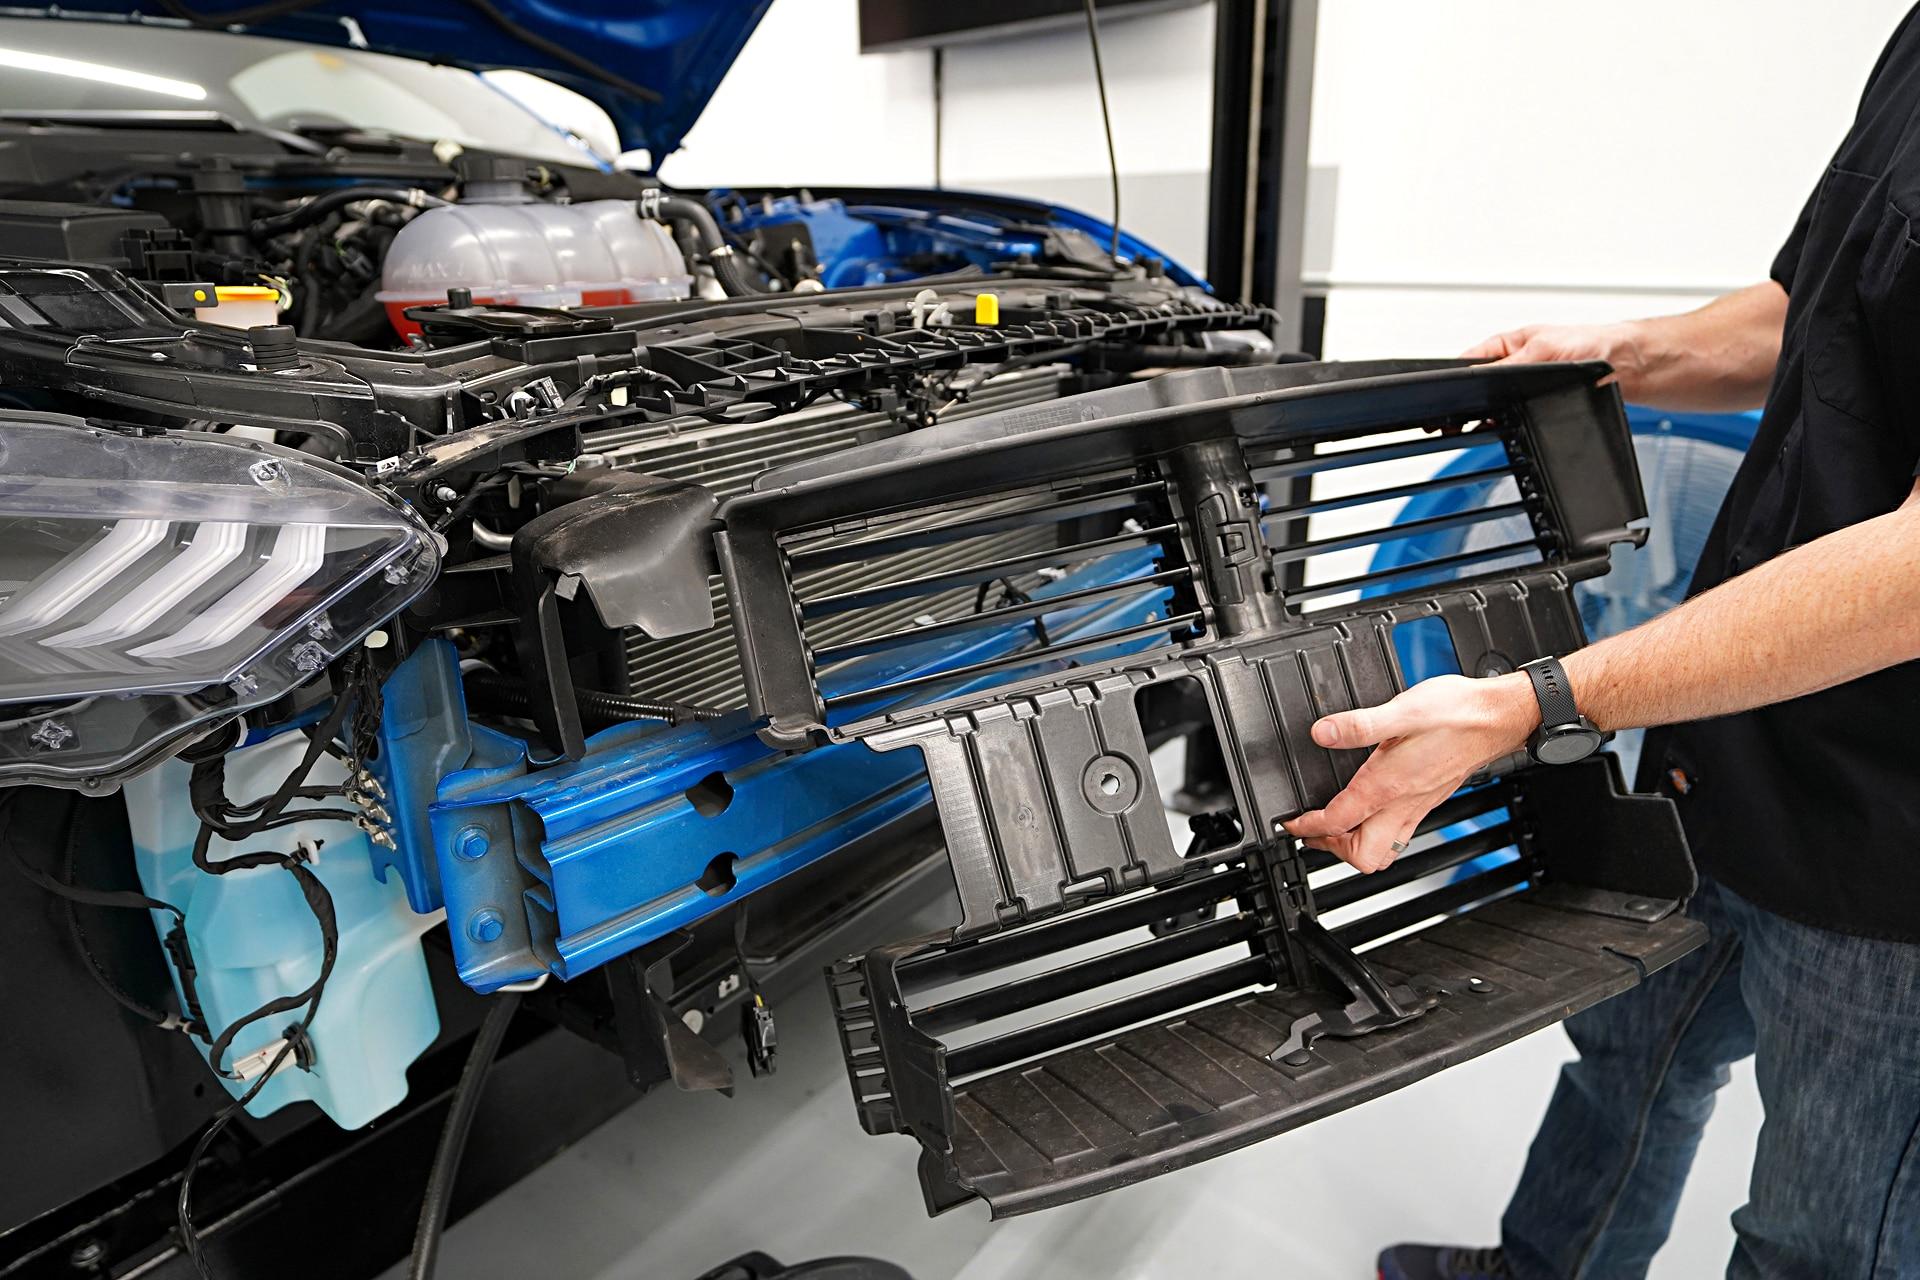 006 Mustang Radiator Shutter Removal